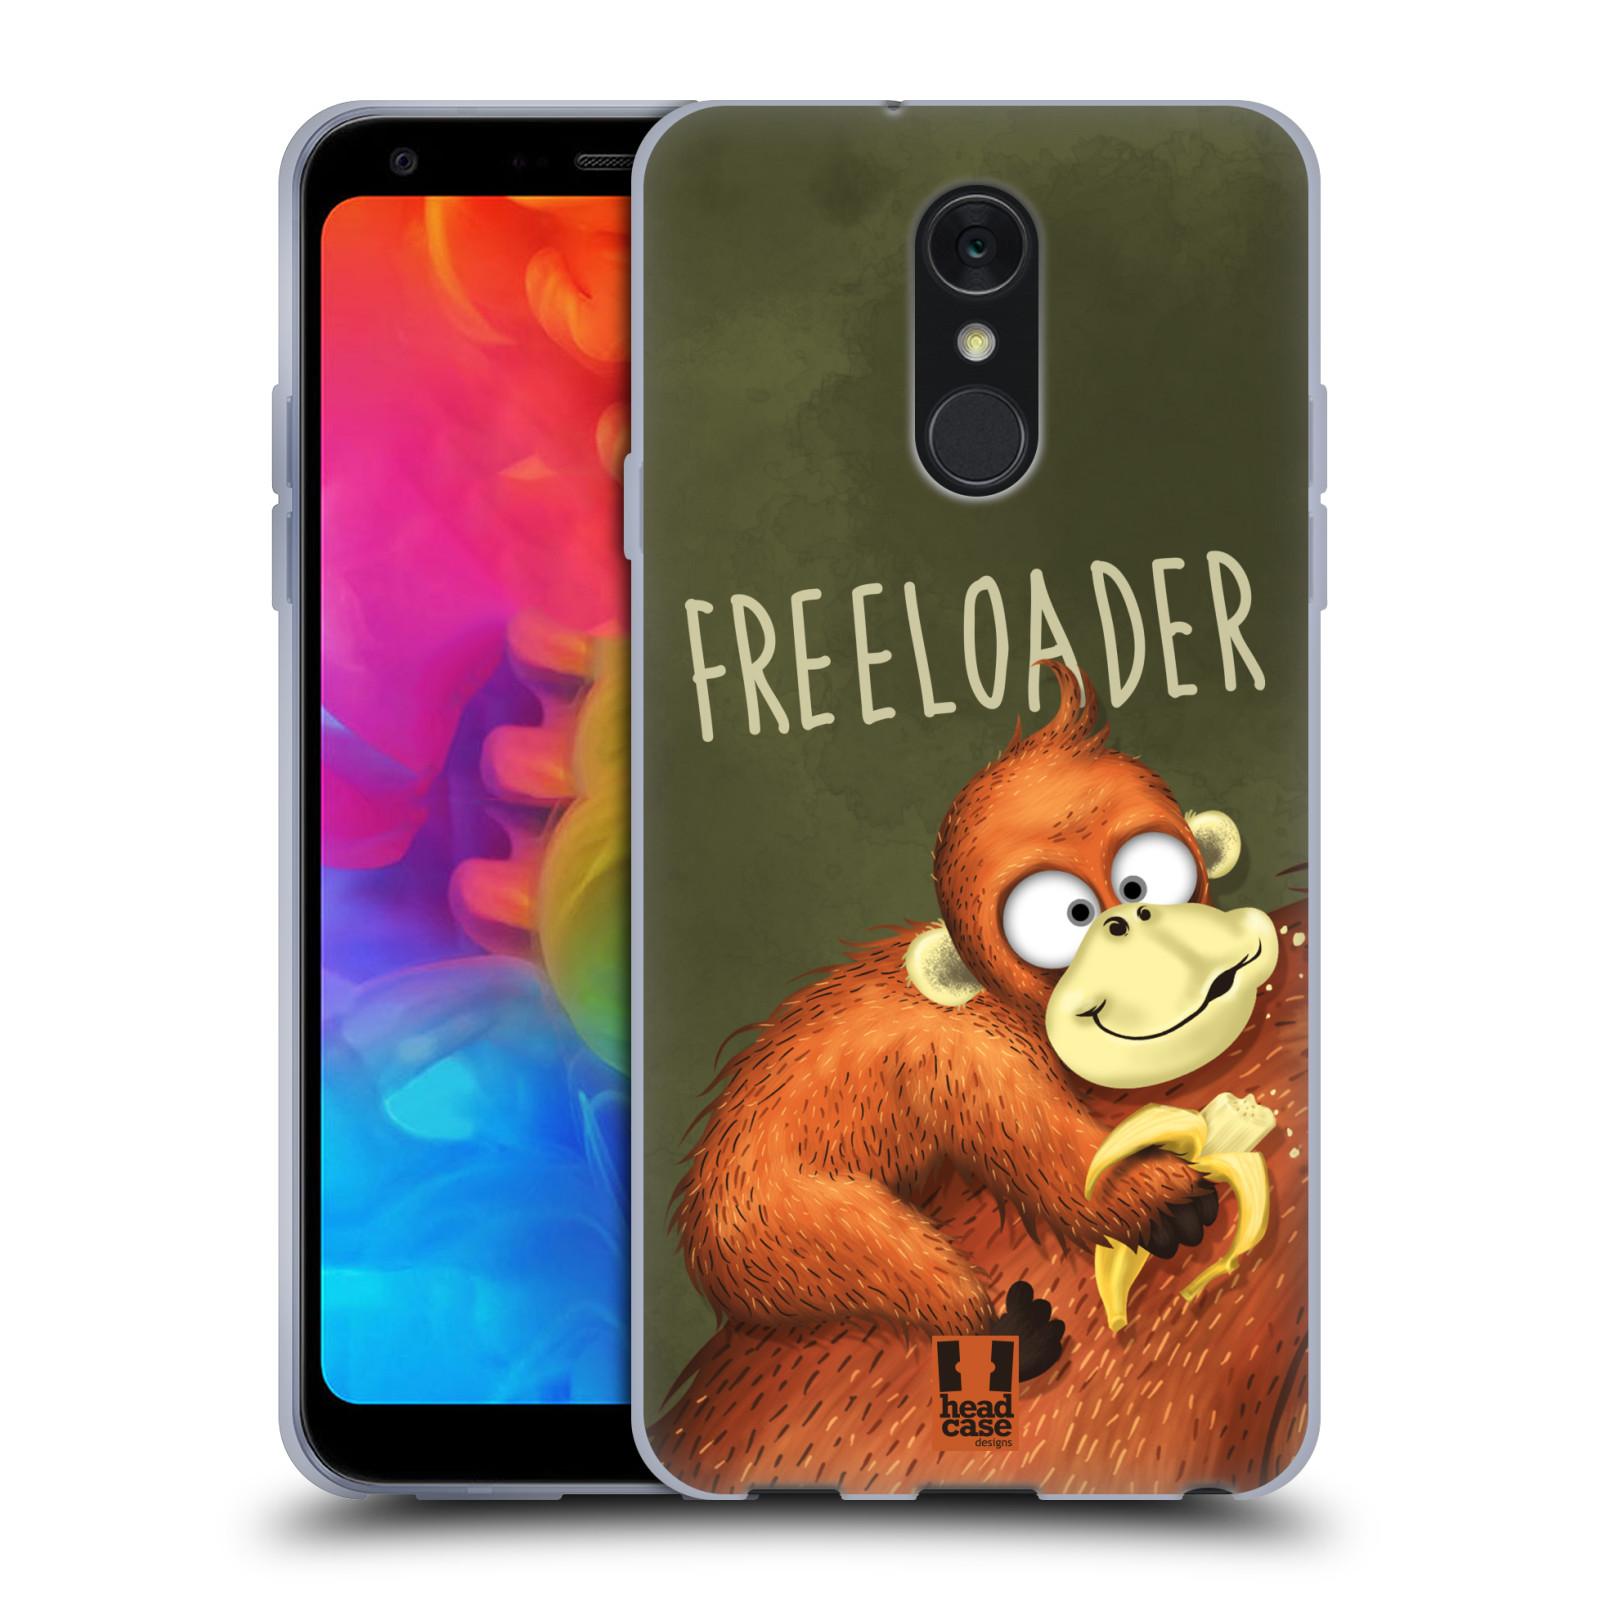 Silikonové pouzdro na mobil LG Q7 - Head Case - Opičák Freeloader